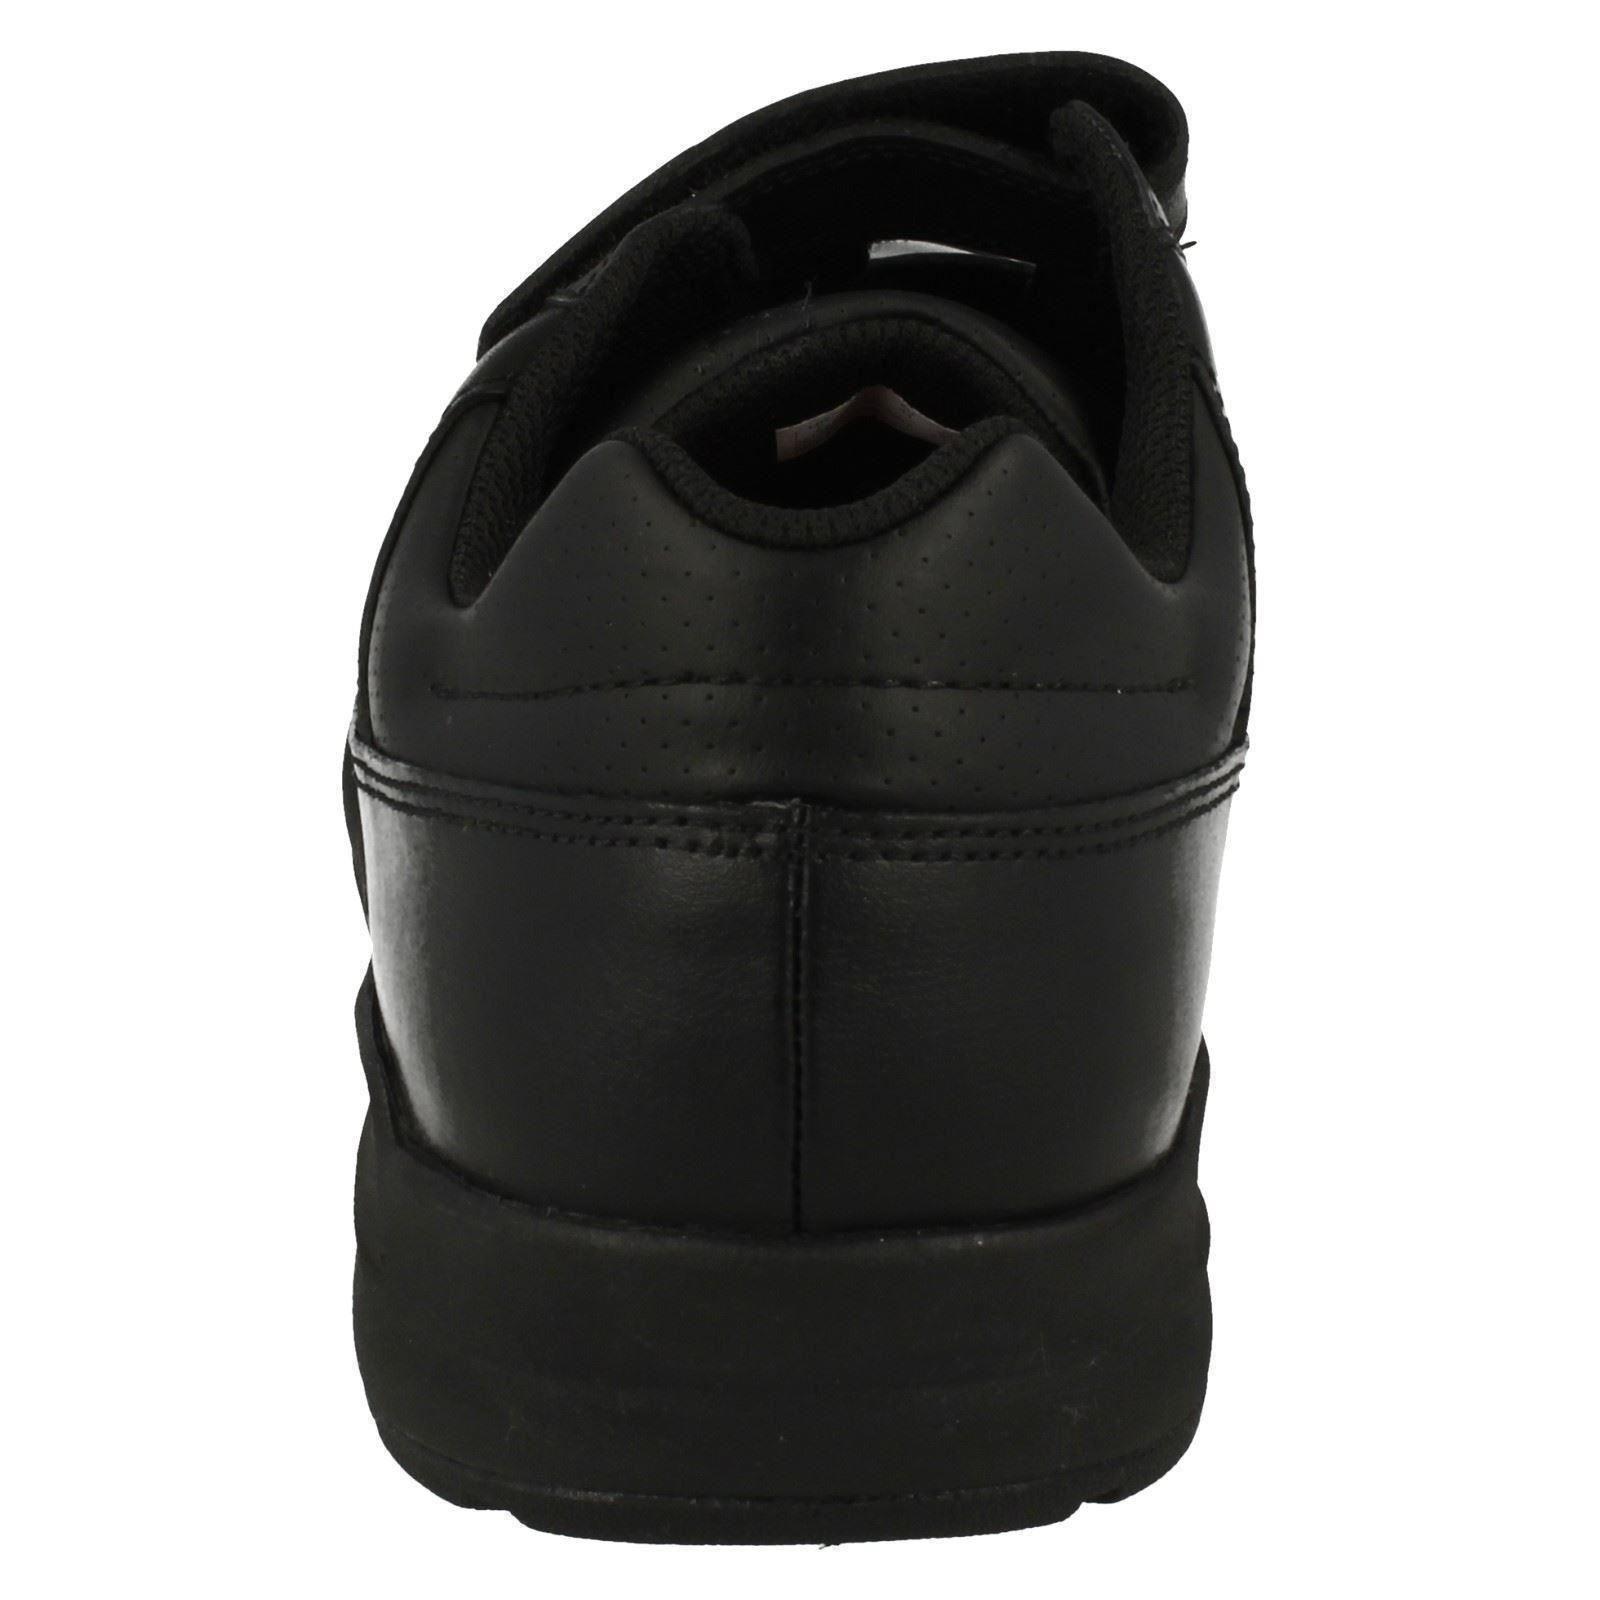 Clarks By Bootleg Lite Monte Zapatos escolares Black School UqawnZ4